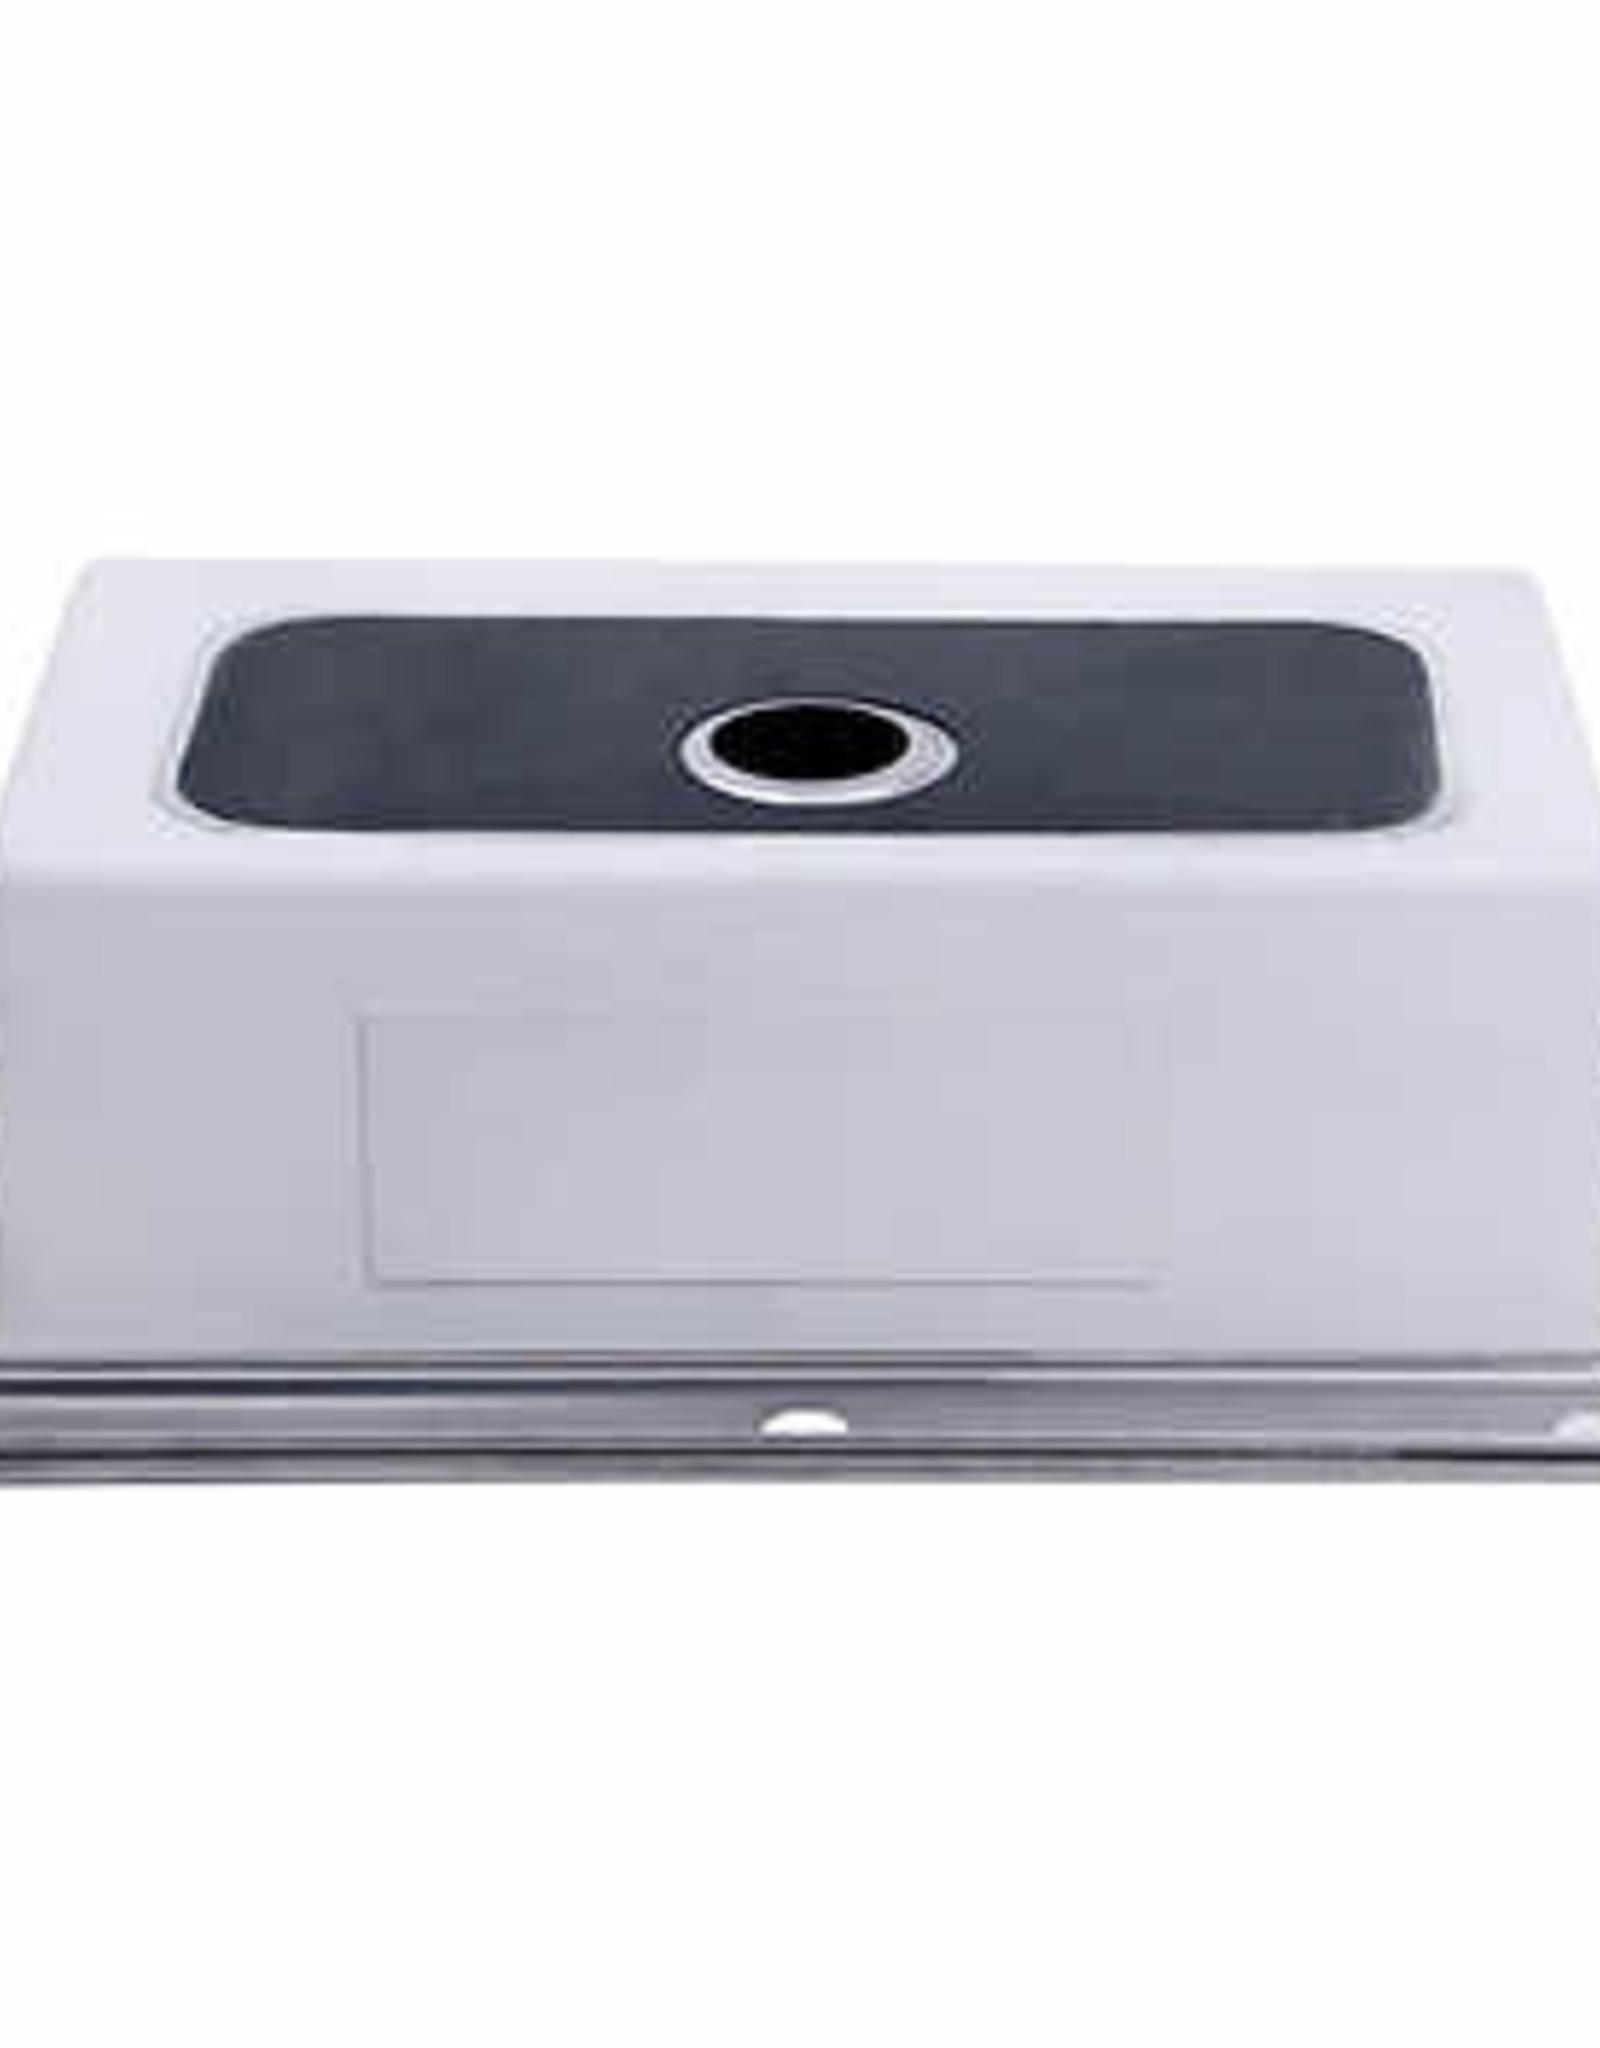 afa usa llc afa stainless 33 inch sink and semi pro faucet combo